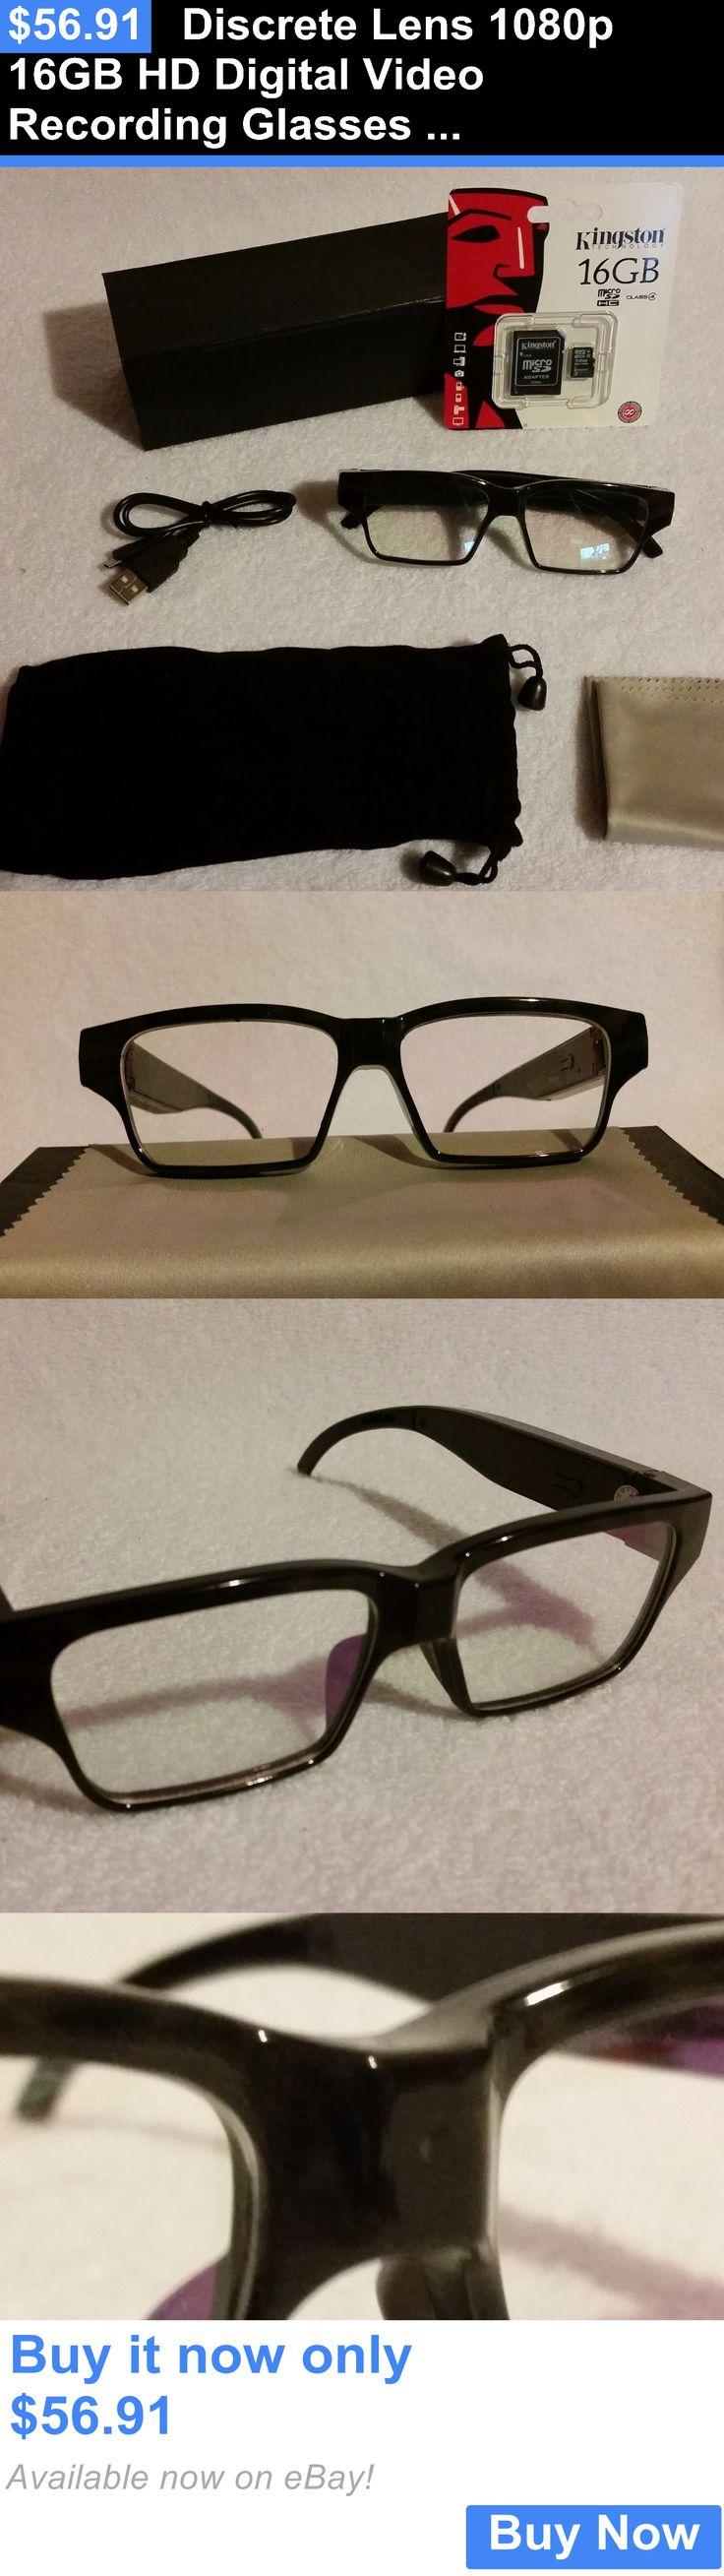 Digital Video Recorders Cards: Discrete Lens 1080P 16Gb Hd Digital Video Recording Glasses Hidden Camera Spy 1 BUY IT NOW ONLY: $56.91